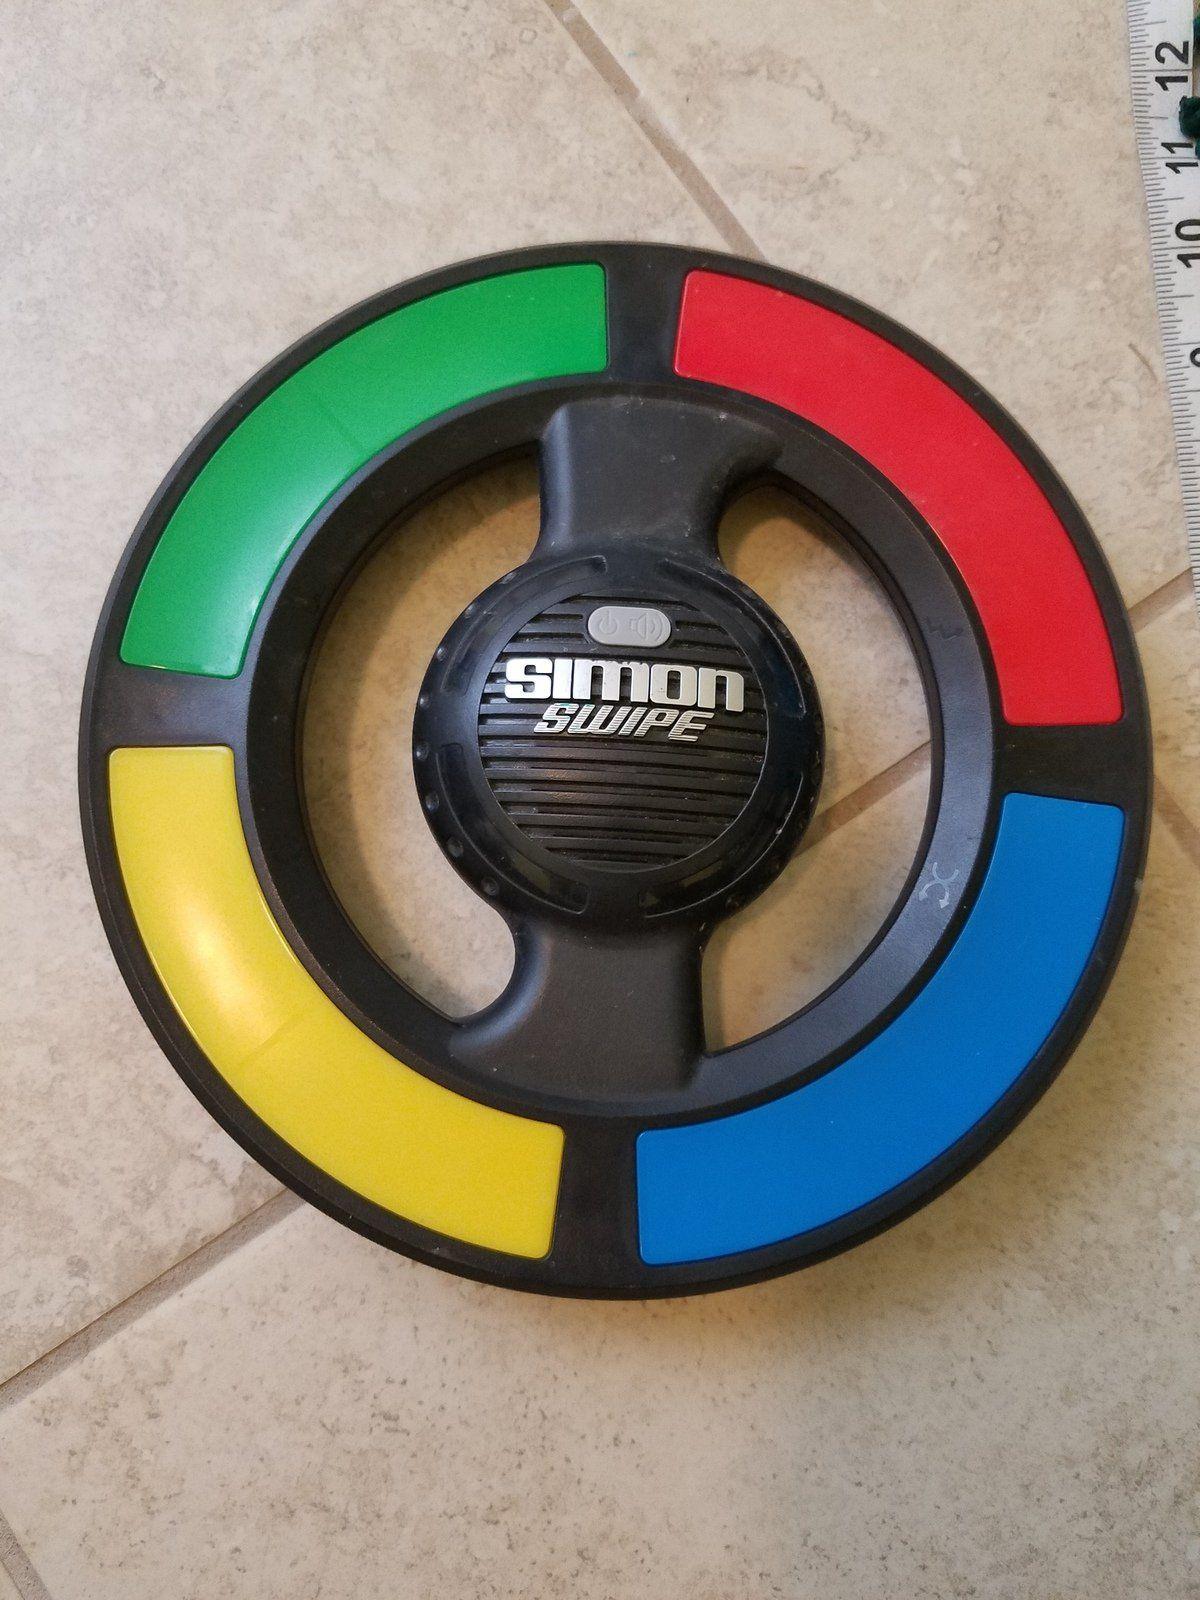 """Simon Swipe"" Game by Hasbro (Gently Used) Hasbro, Games"